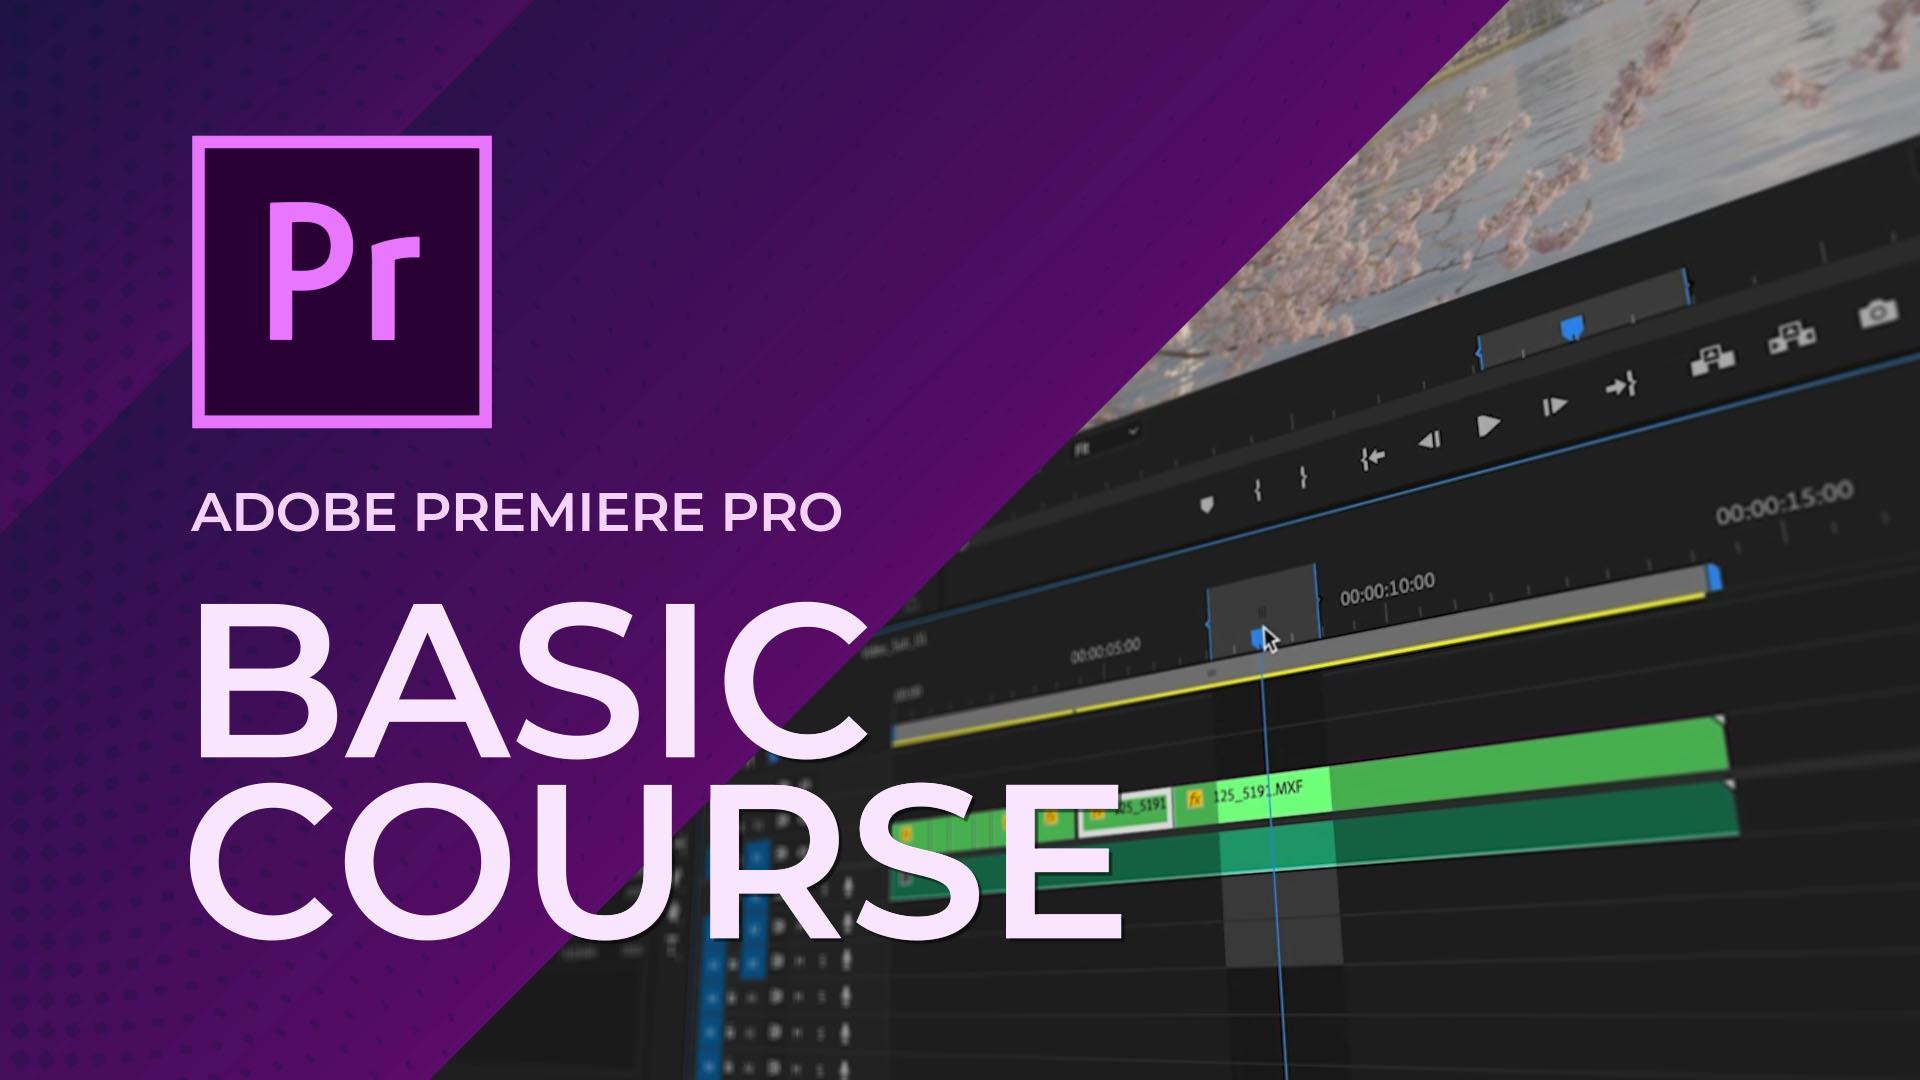 Basic Premiere Pro